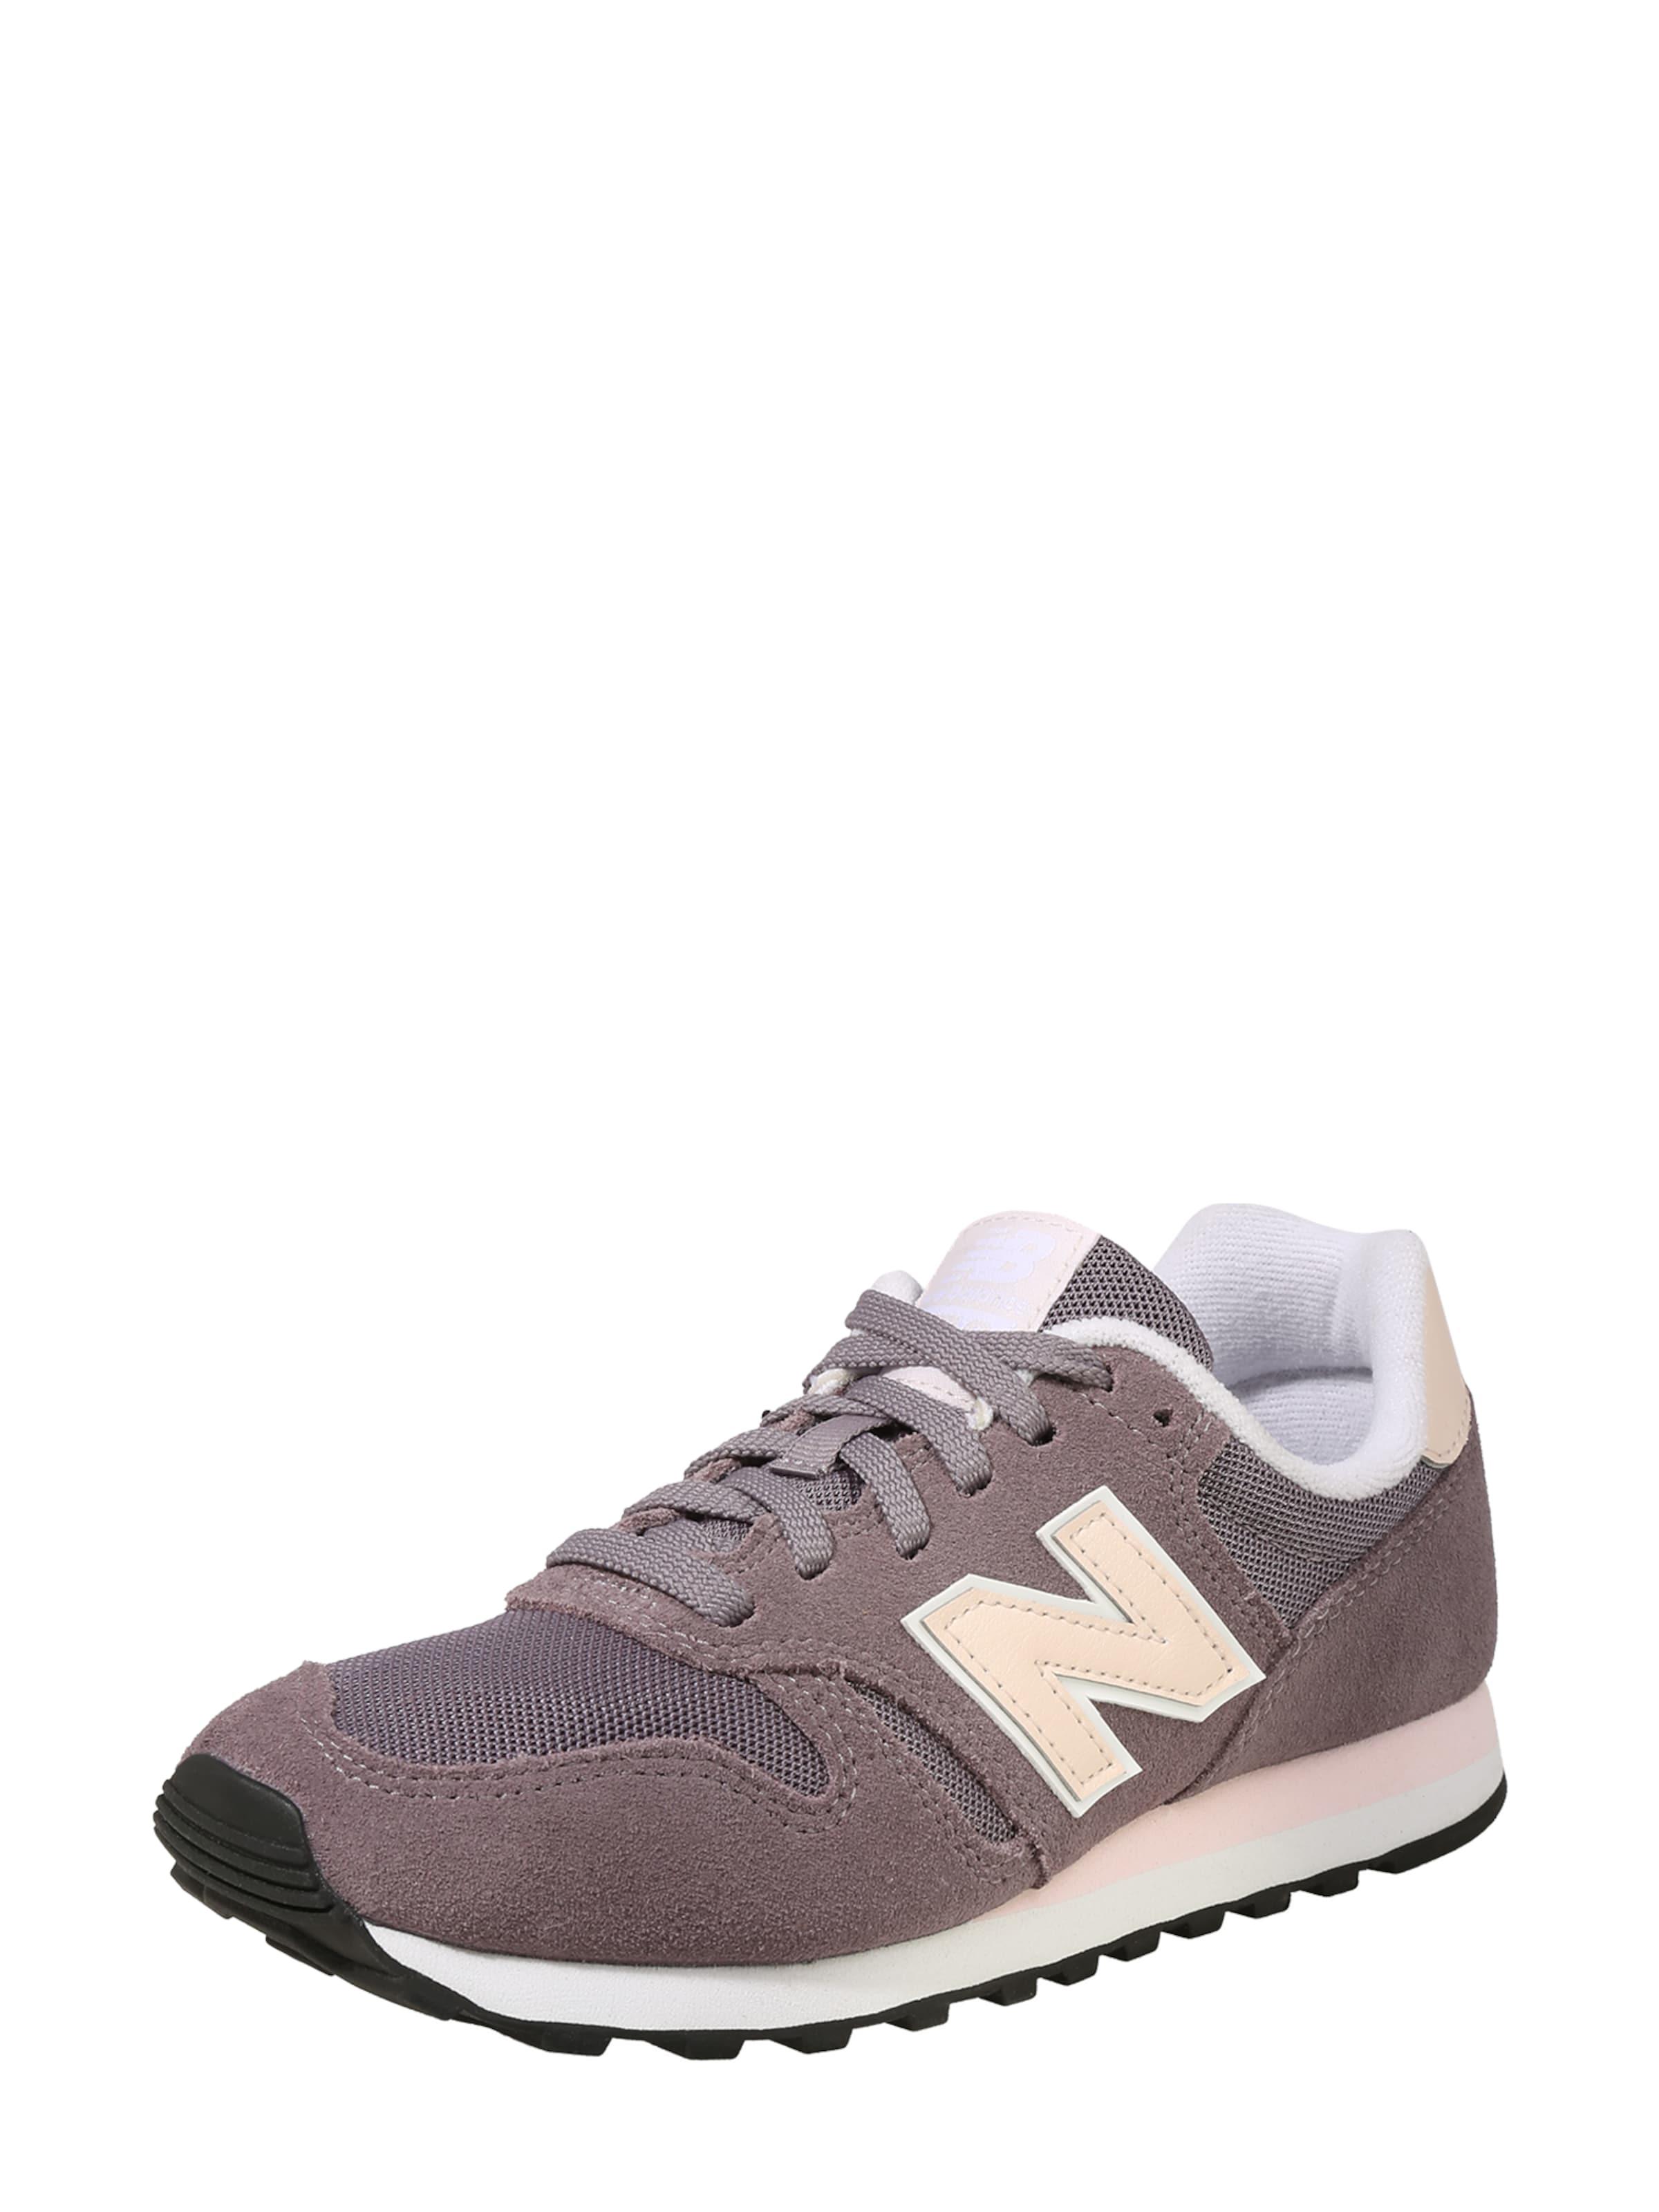 FliederDunkellila Sneaker In New 'wl373' Puder Balance Ajc34RLS5q